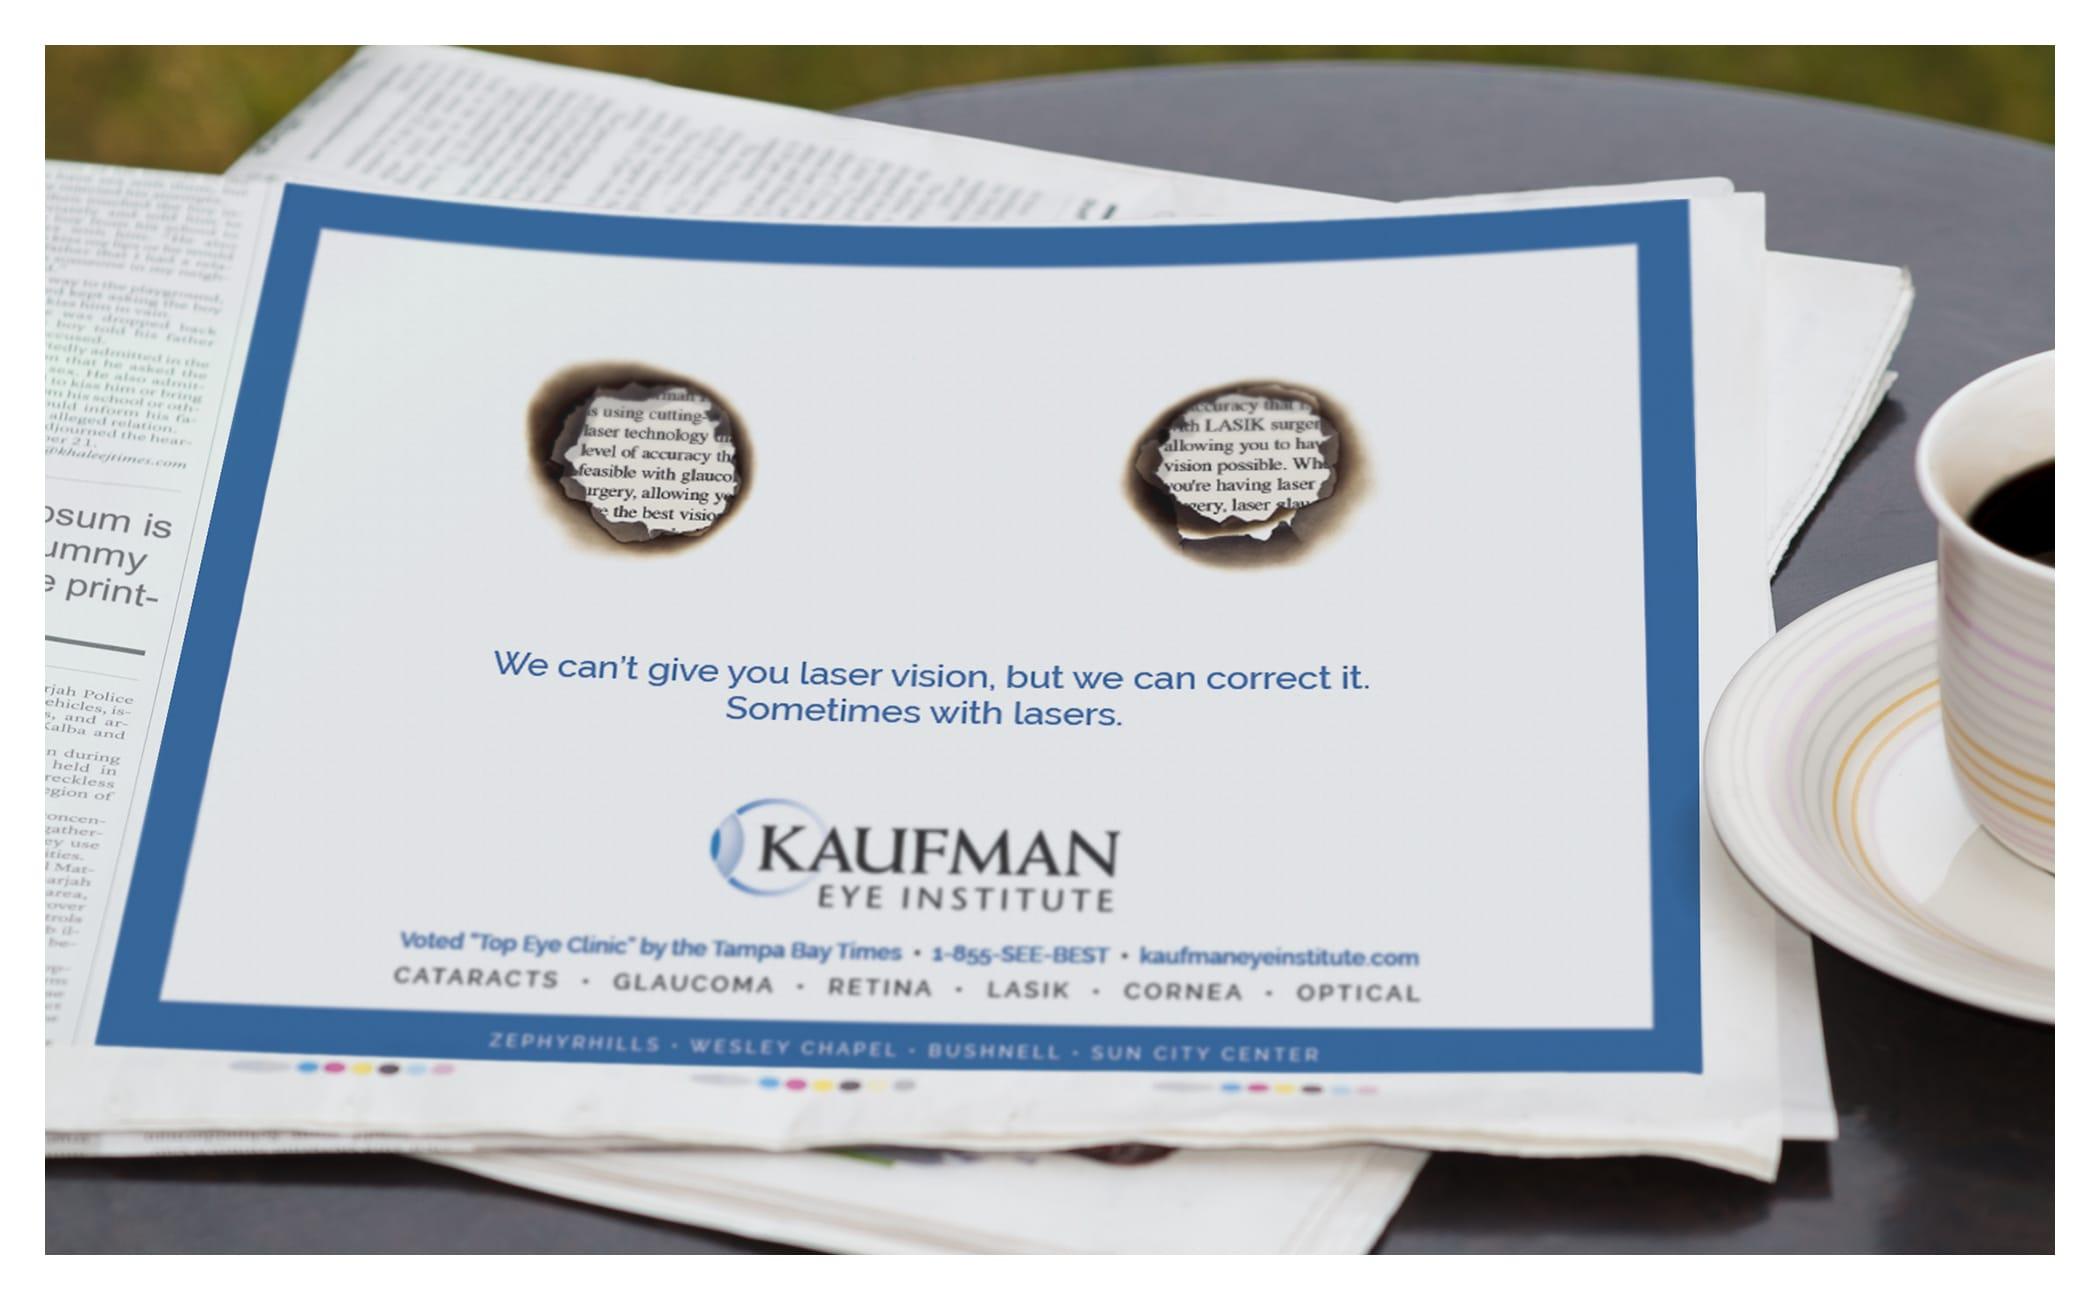 Photo of Kaufman Eye Institute newspaper ad